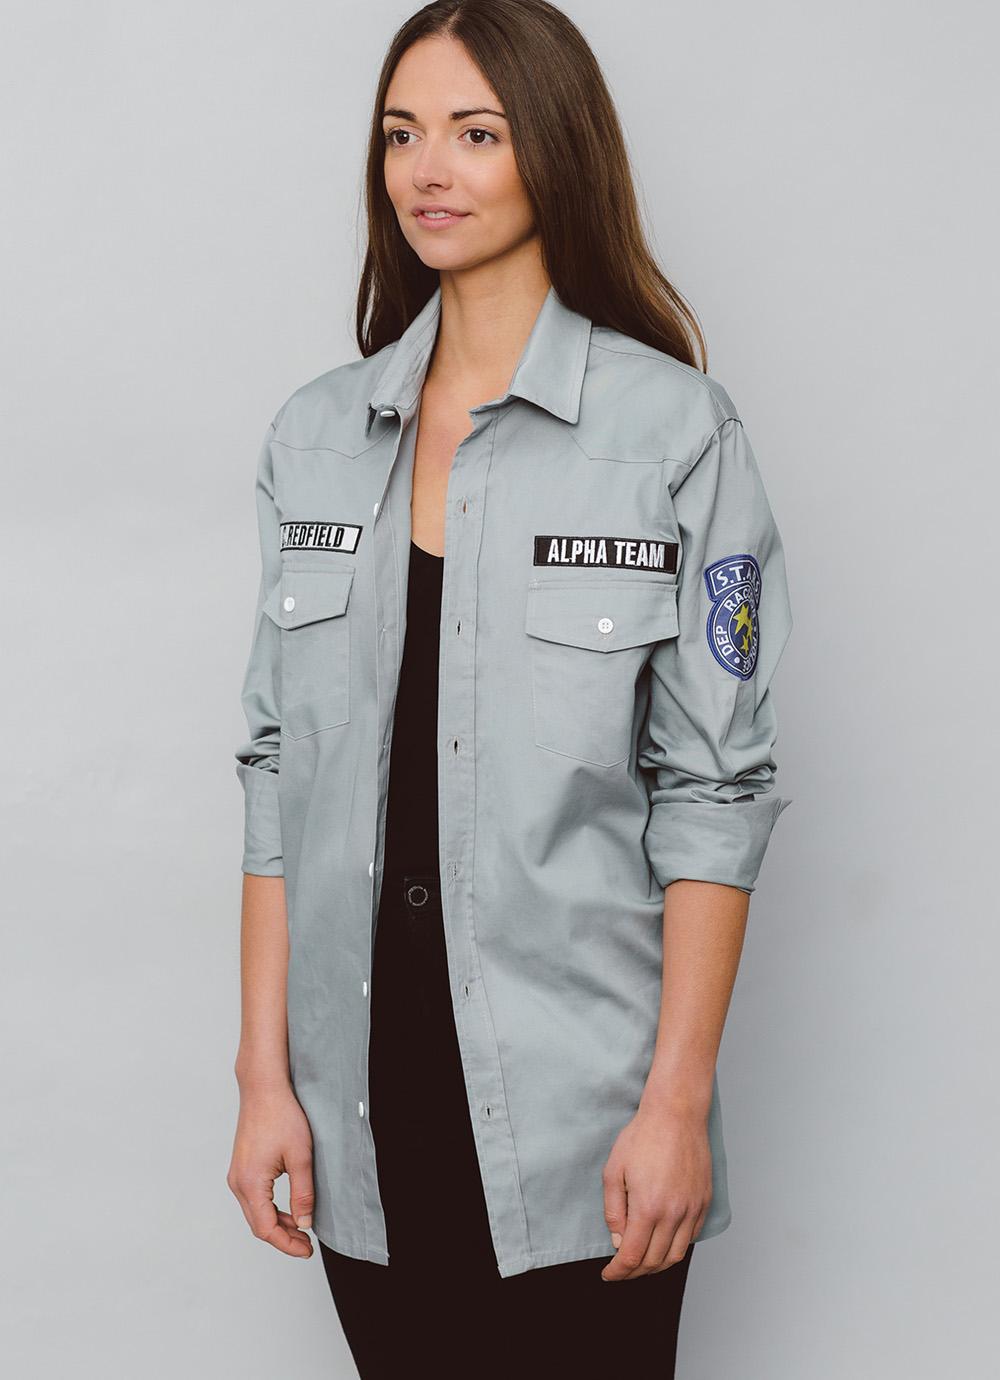 CarbonX Clothing: Men's Black Fire-Resistant Active Base Layer Shirt 96 1 9020